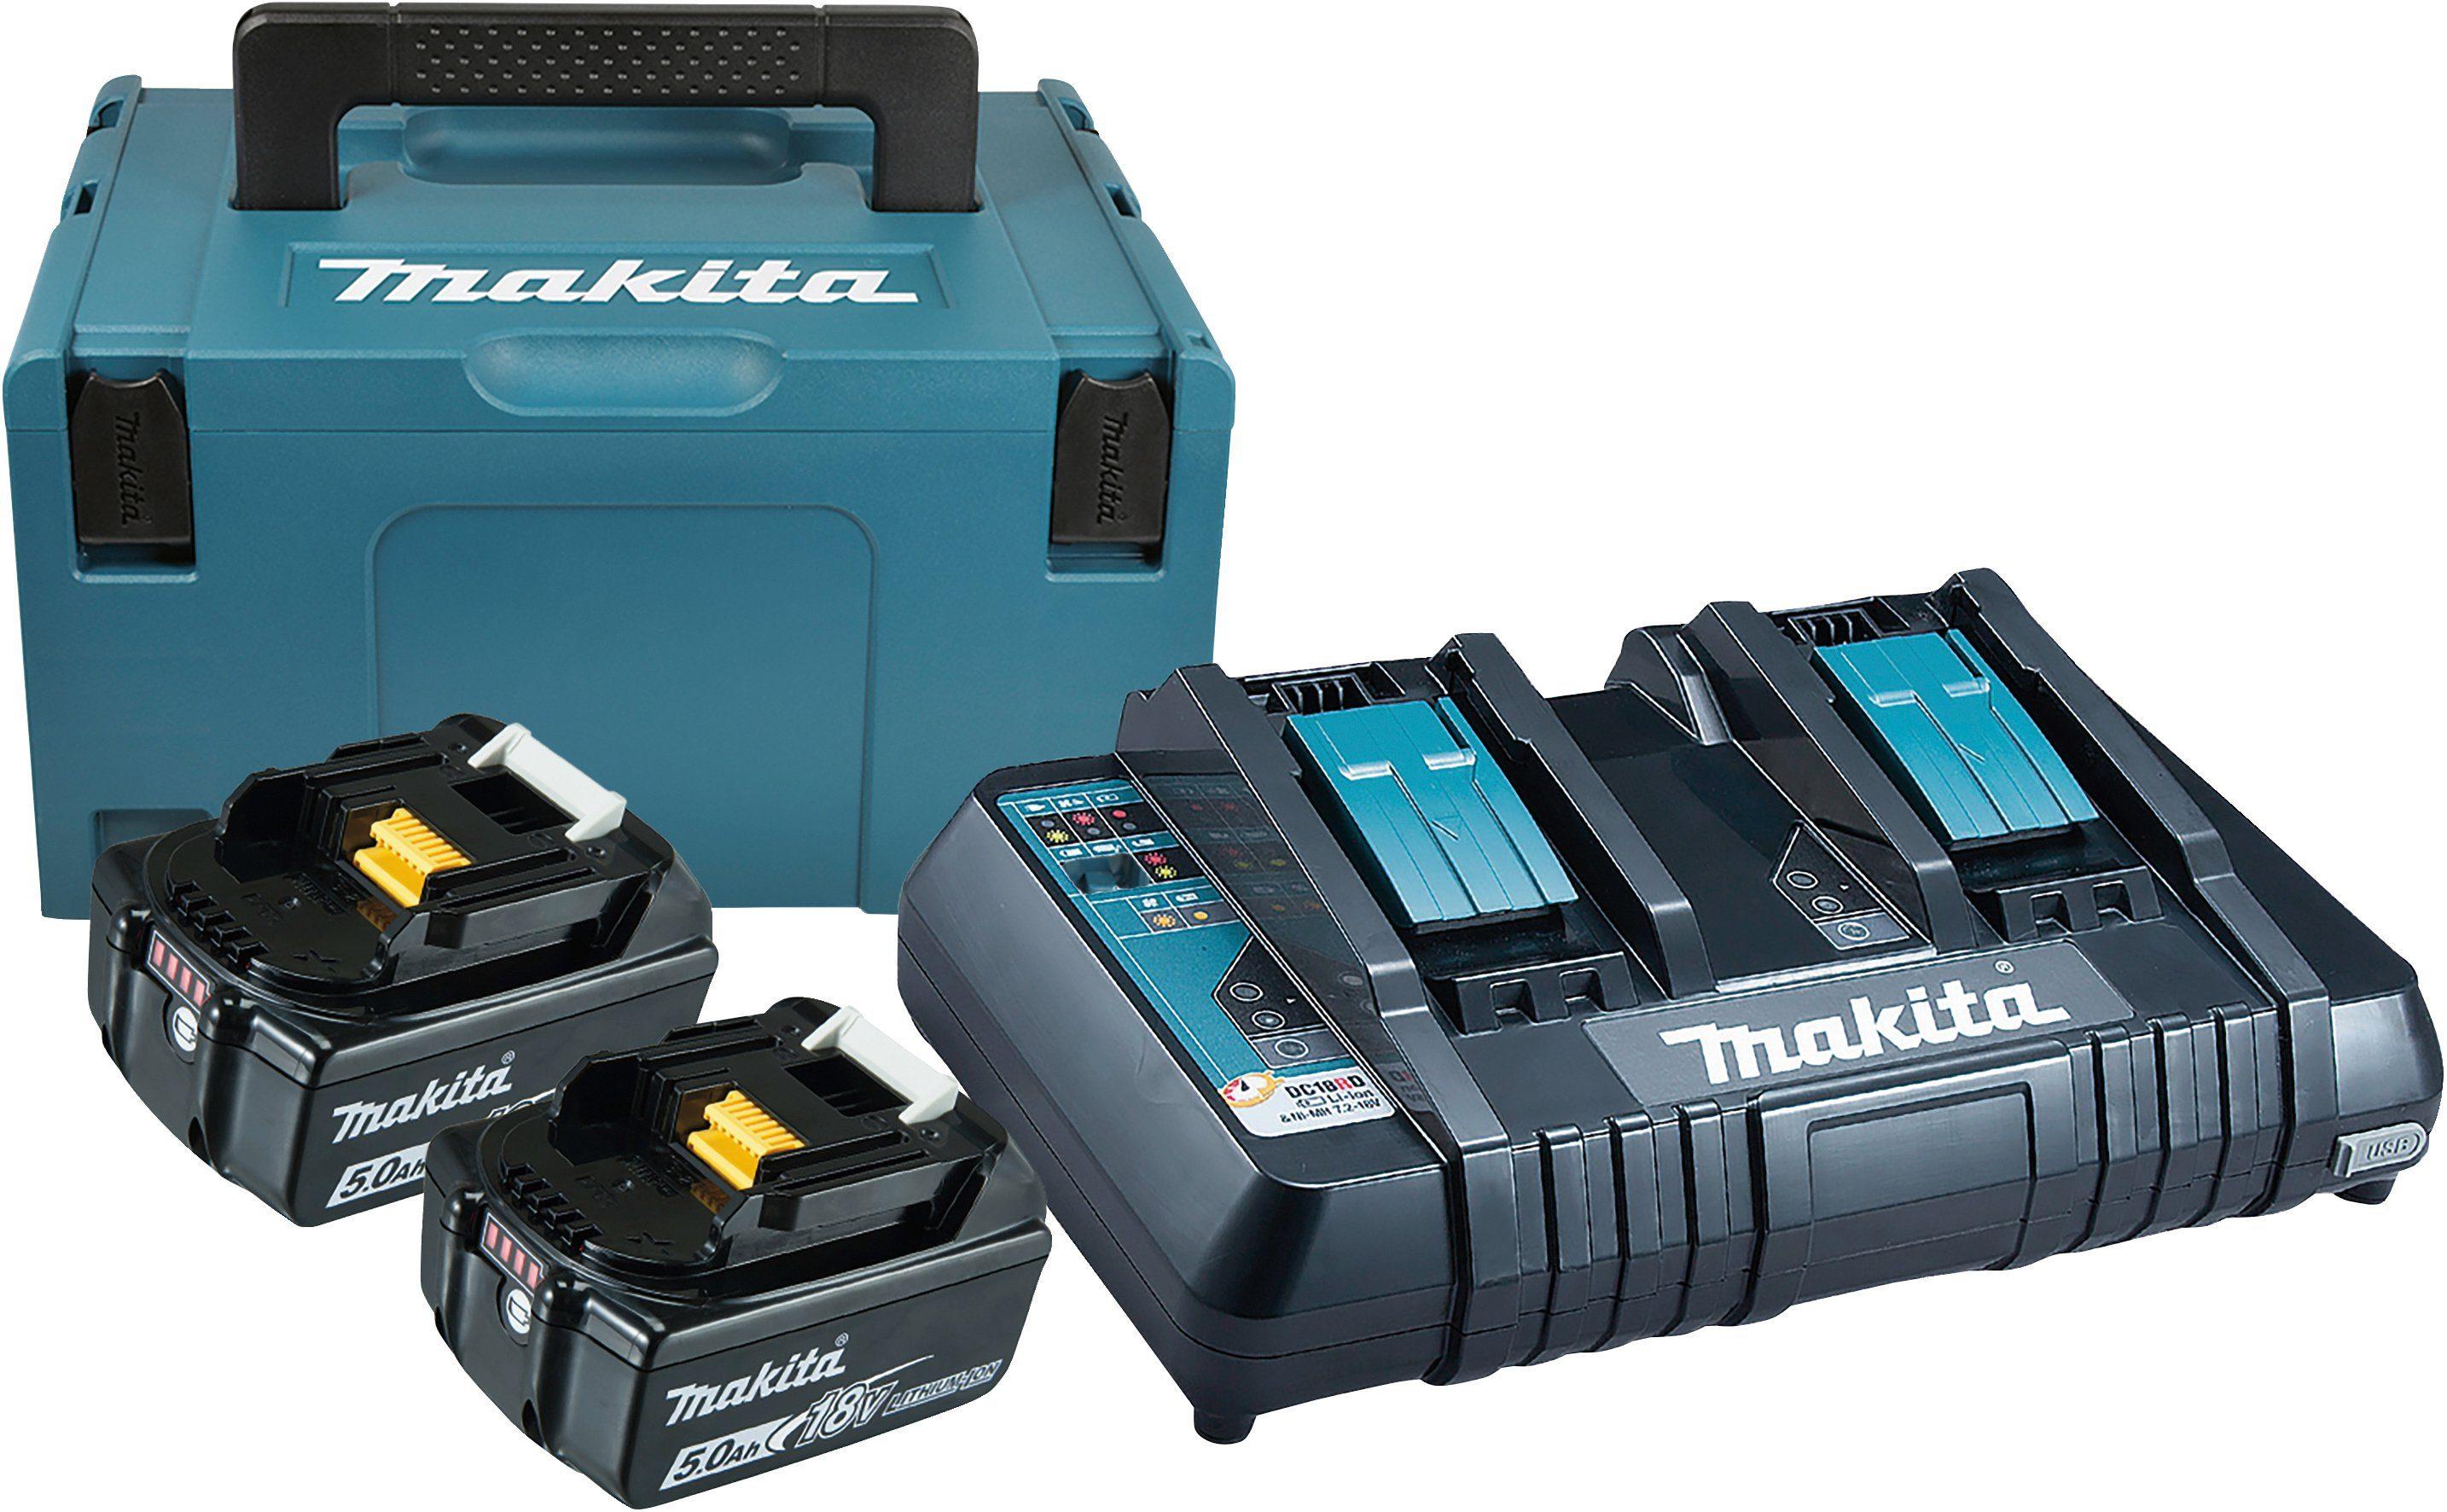 Makita Entfernungsmesser Kaufen : Makita laser entfernungsmesser u